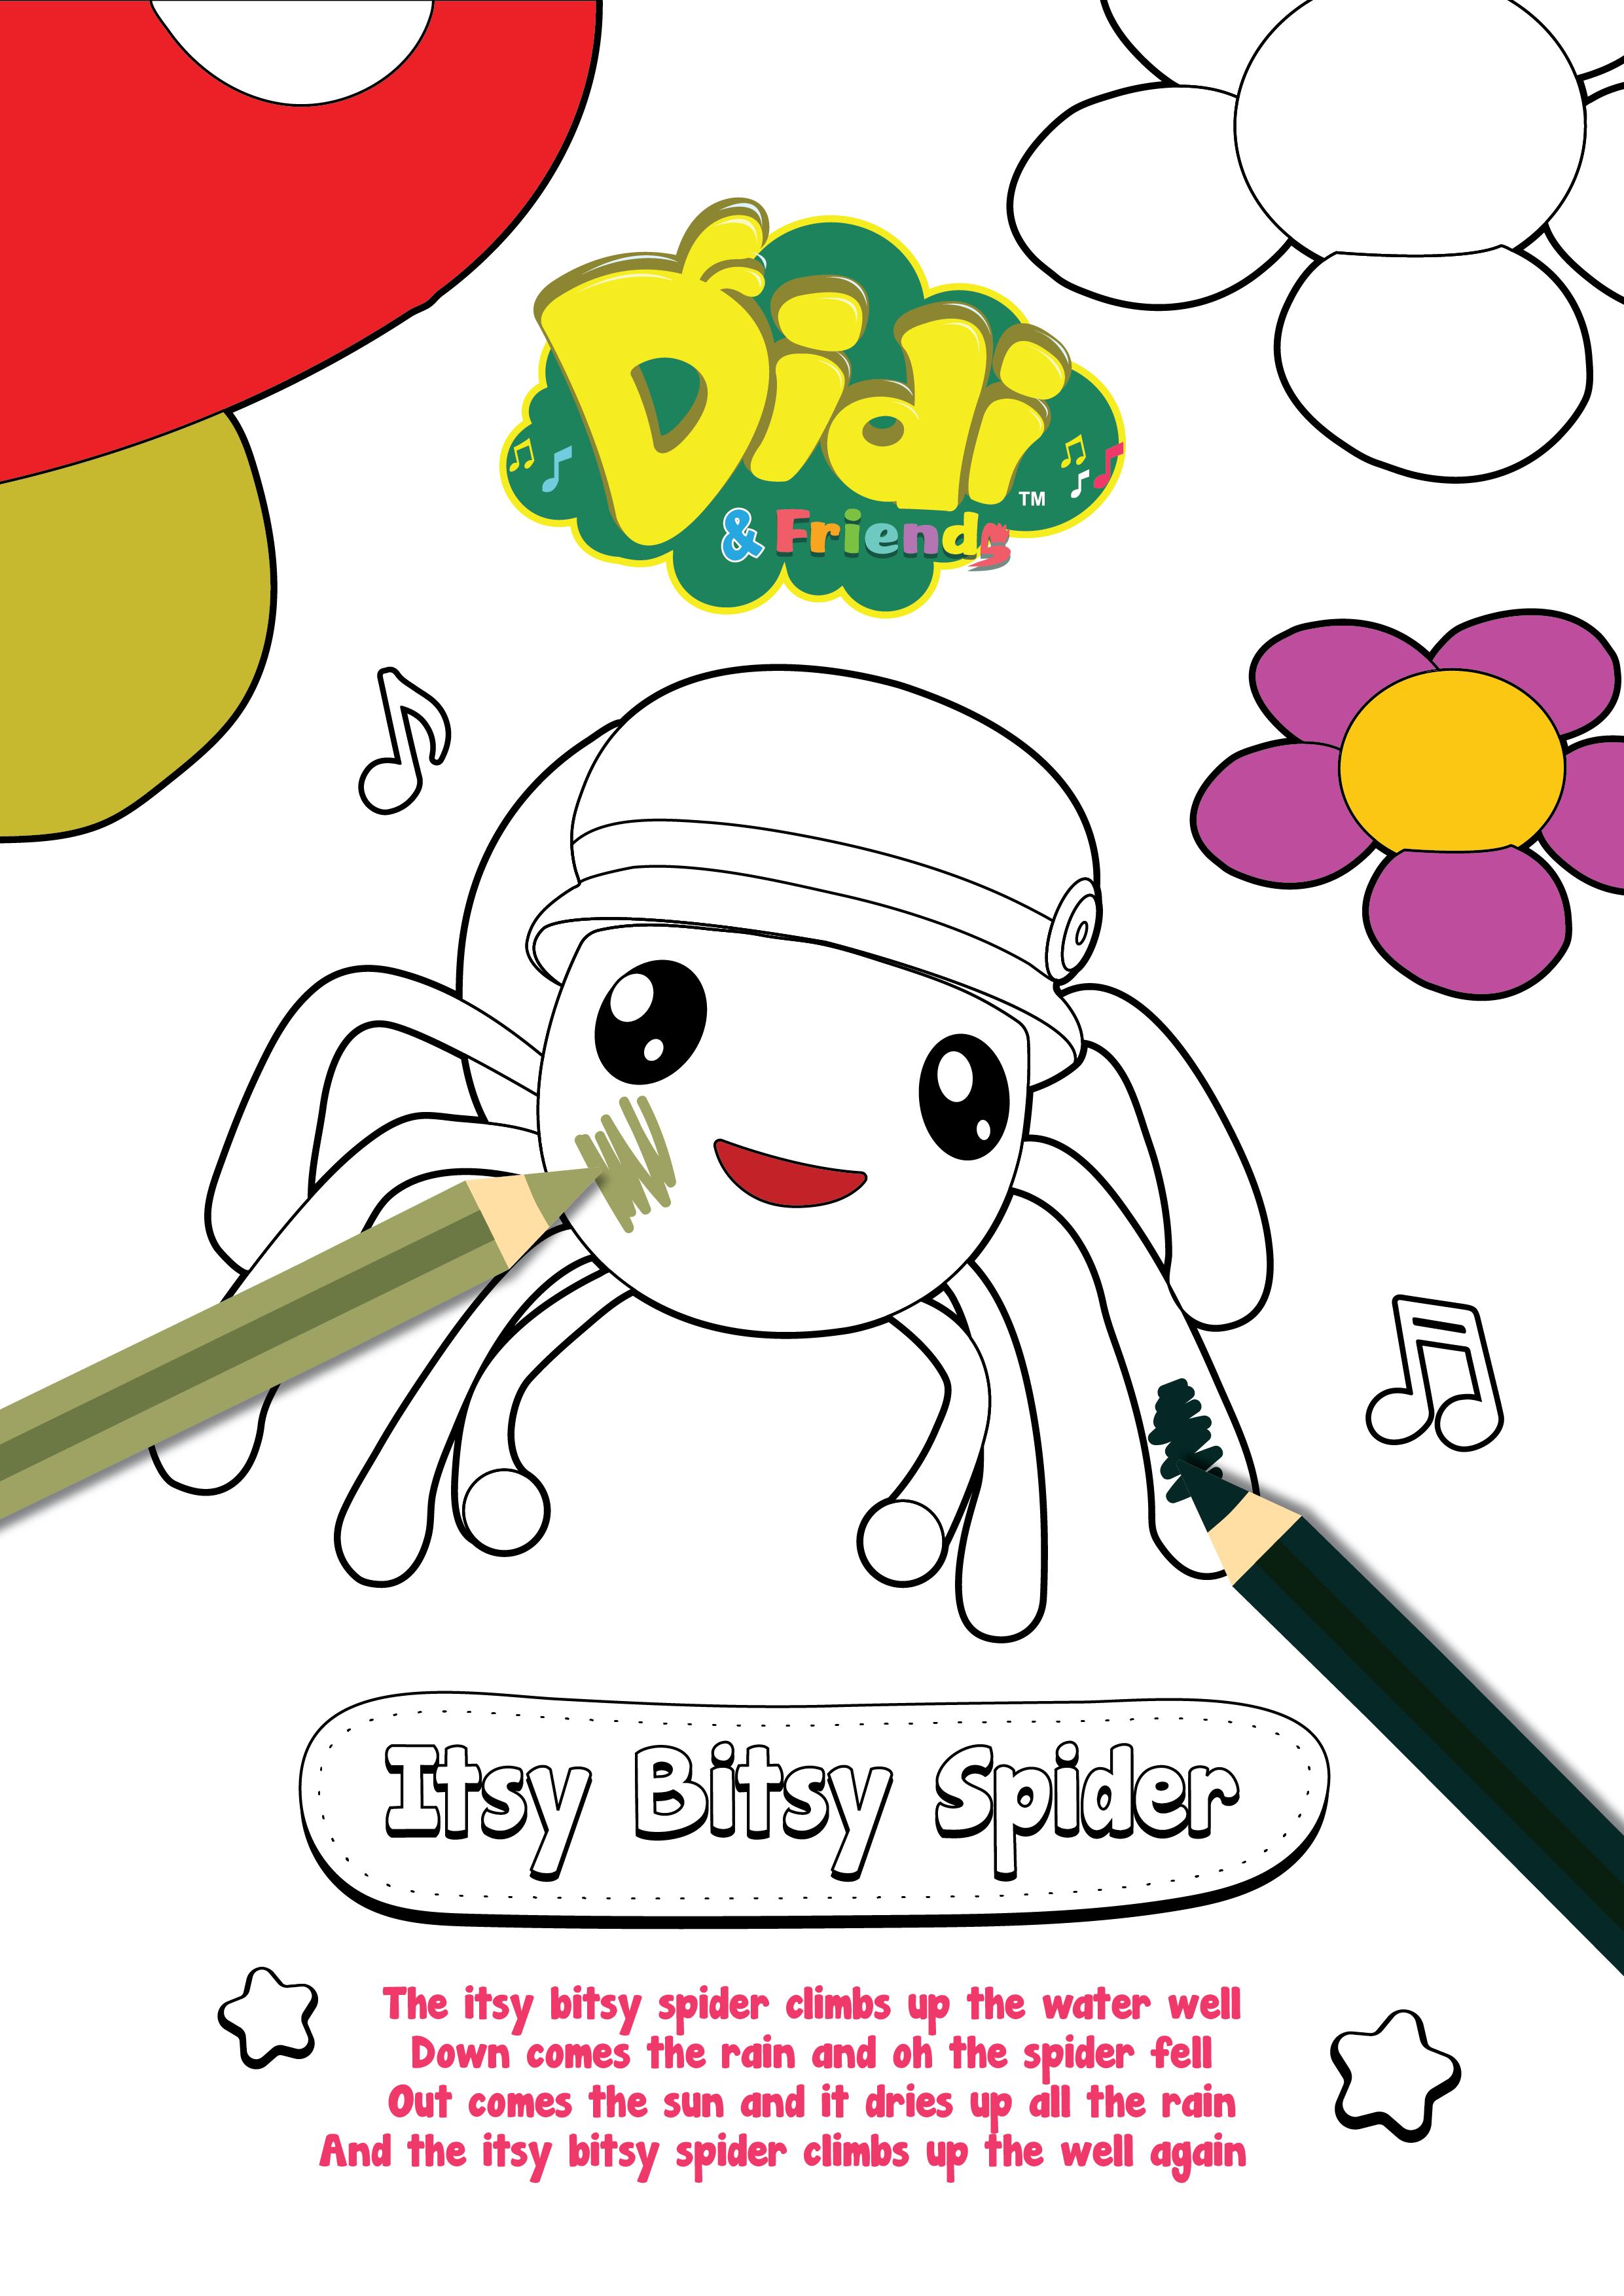 Free Colouring Sheet Didi Friends Free Coloring Sheets Craft Free Coloring Sheets For Kids